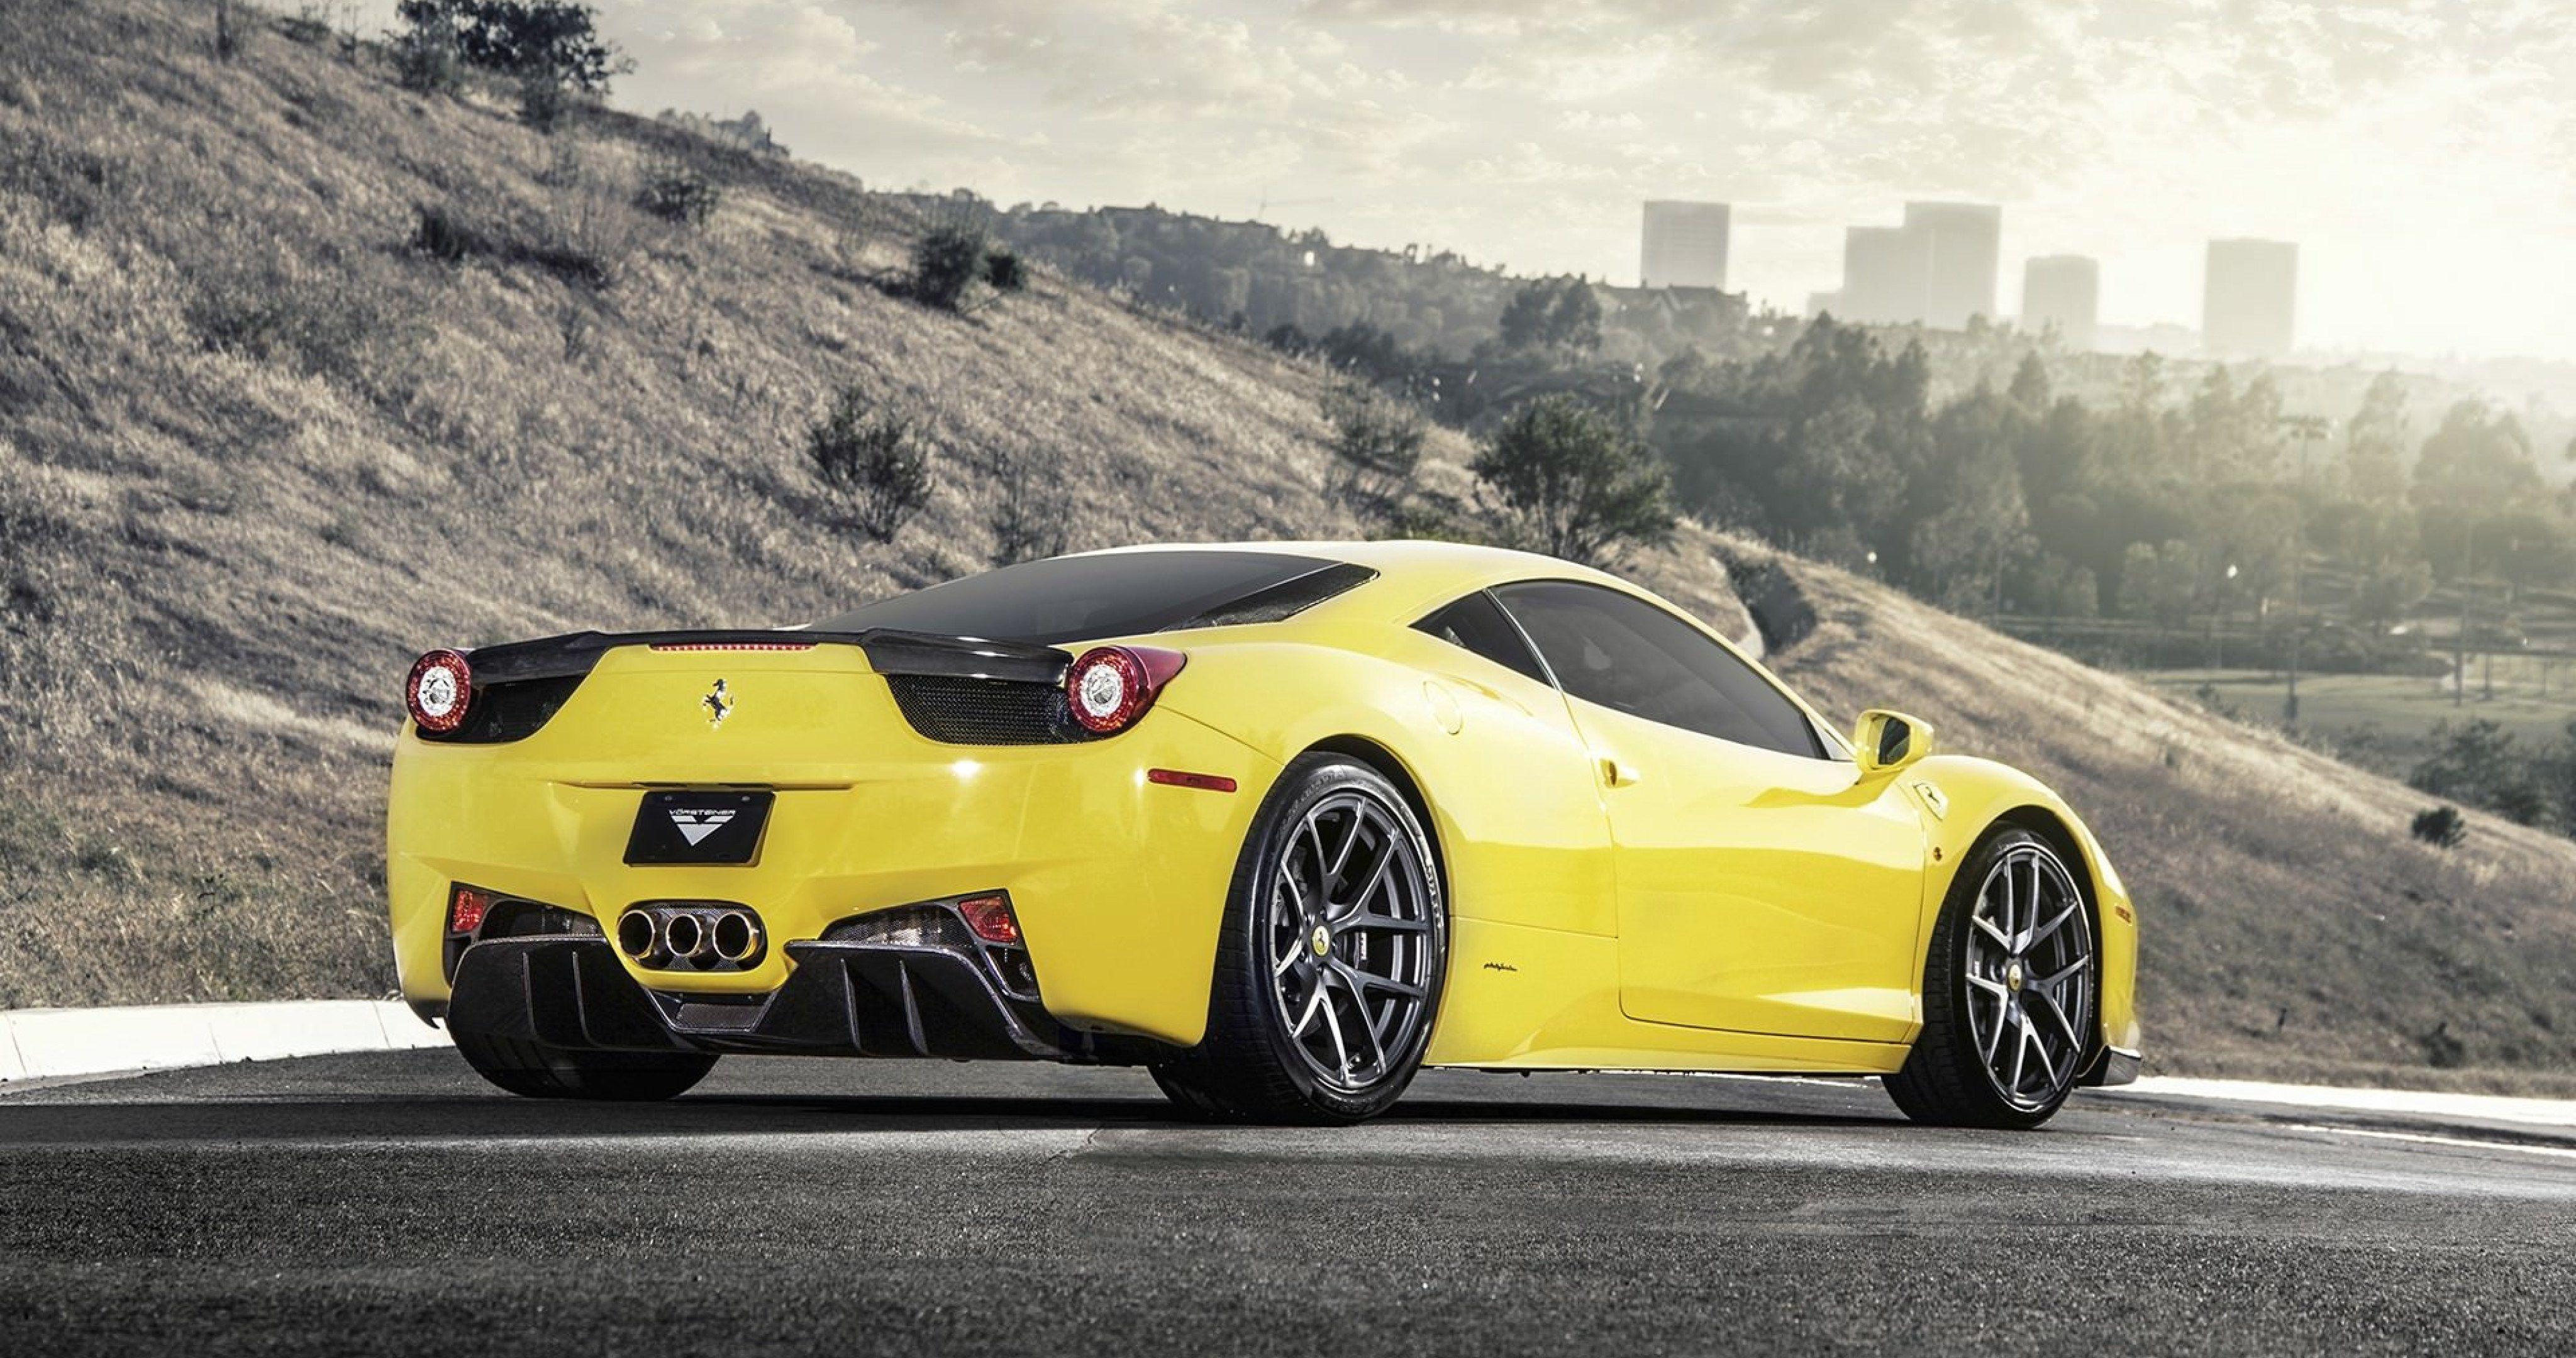 Ferrari 458 Italia 4k Ultra Hd Wallpaper Ololoshenka Pinterest